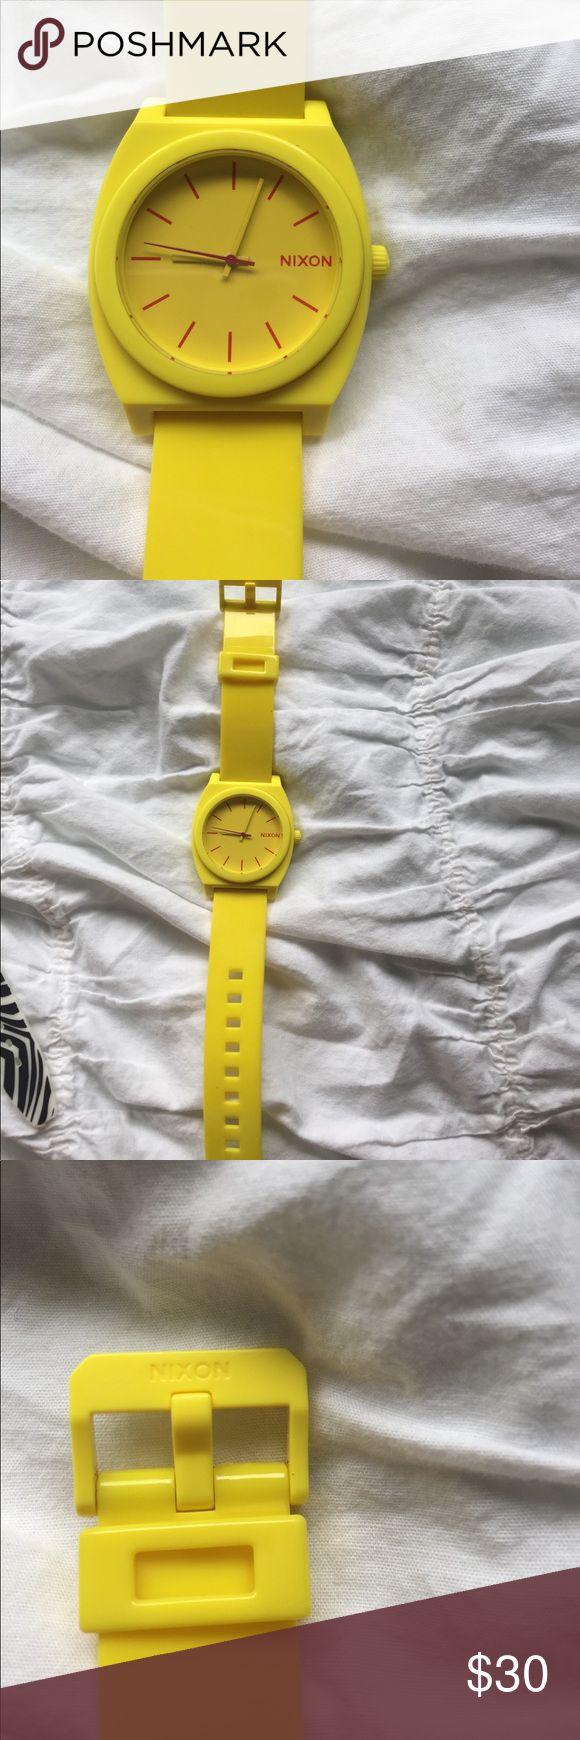 Yellow Nixon Watch Beautiful yellow Nixon watch! Perfect condition. Barely worn. Bright yellow color. Nixon Accessories Watches